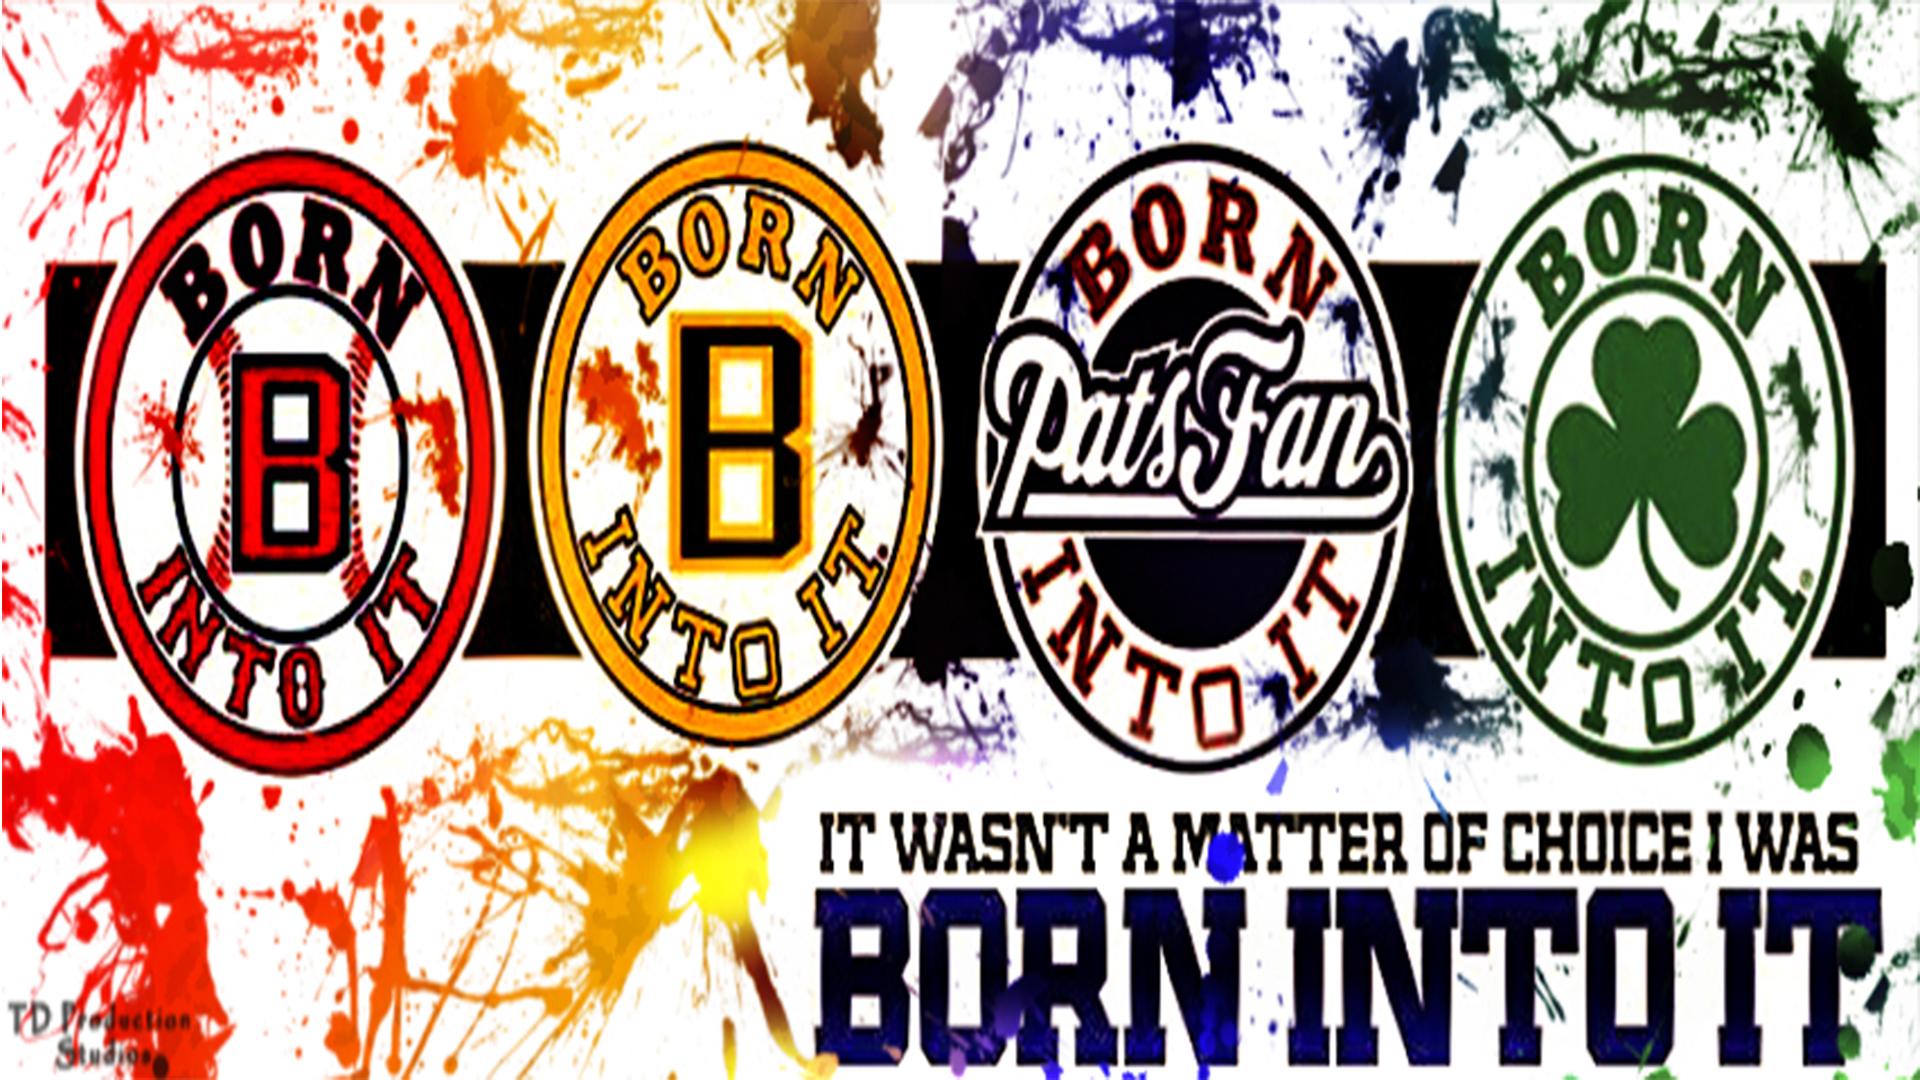 Boston Sports DE 1920 x1080 by TDProductionStudios 1920x1080